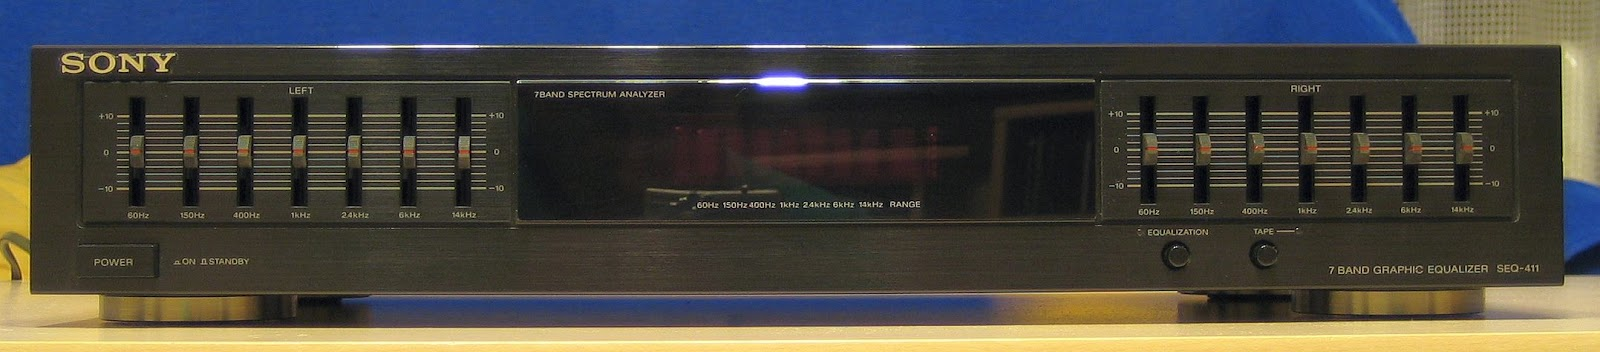 sony seq-411 user manual